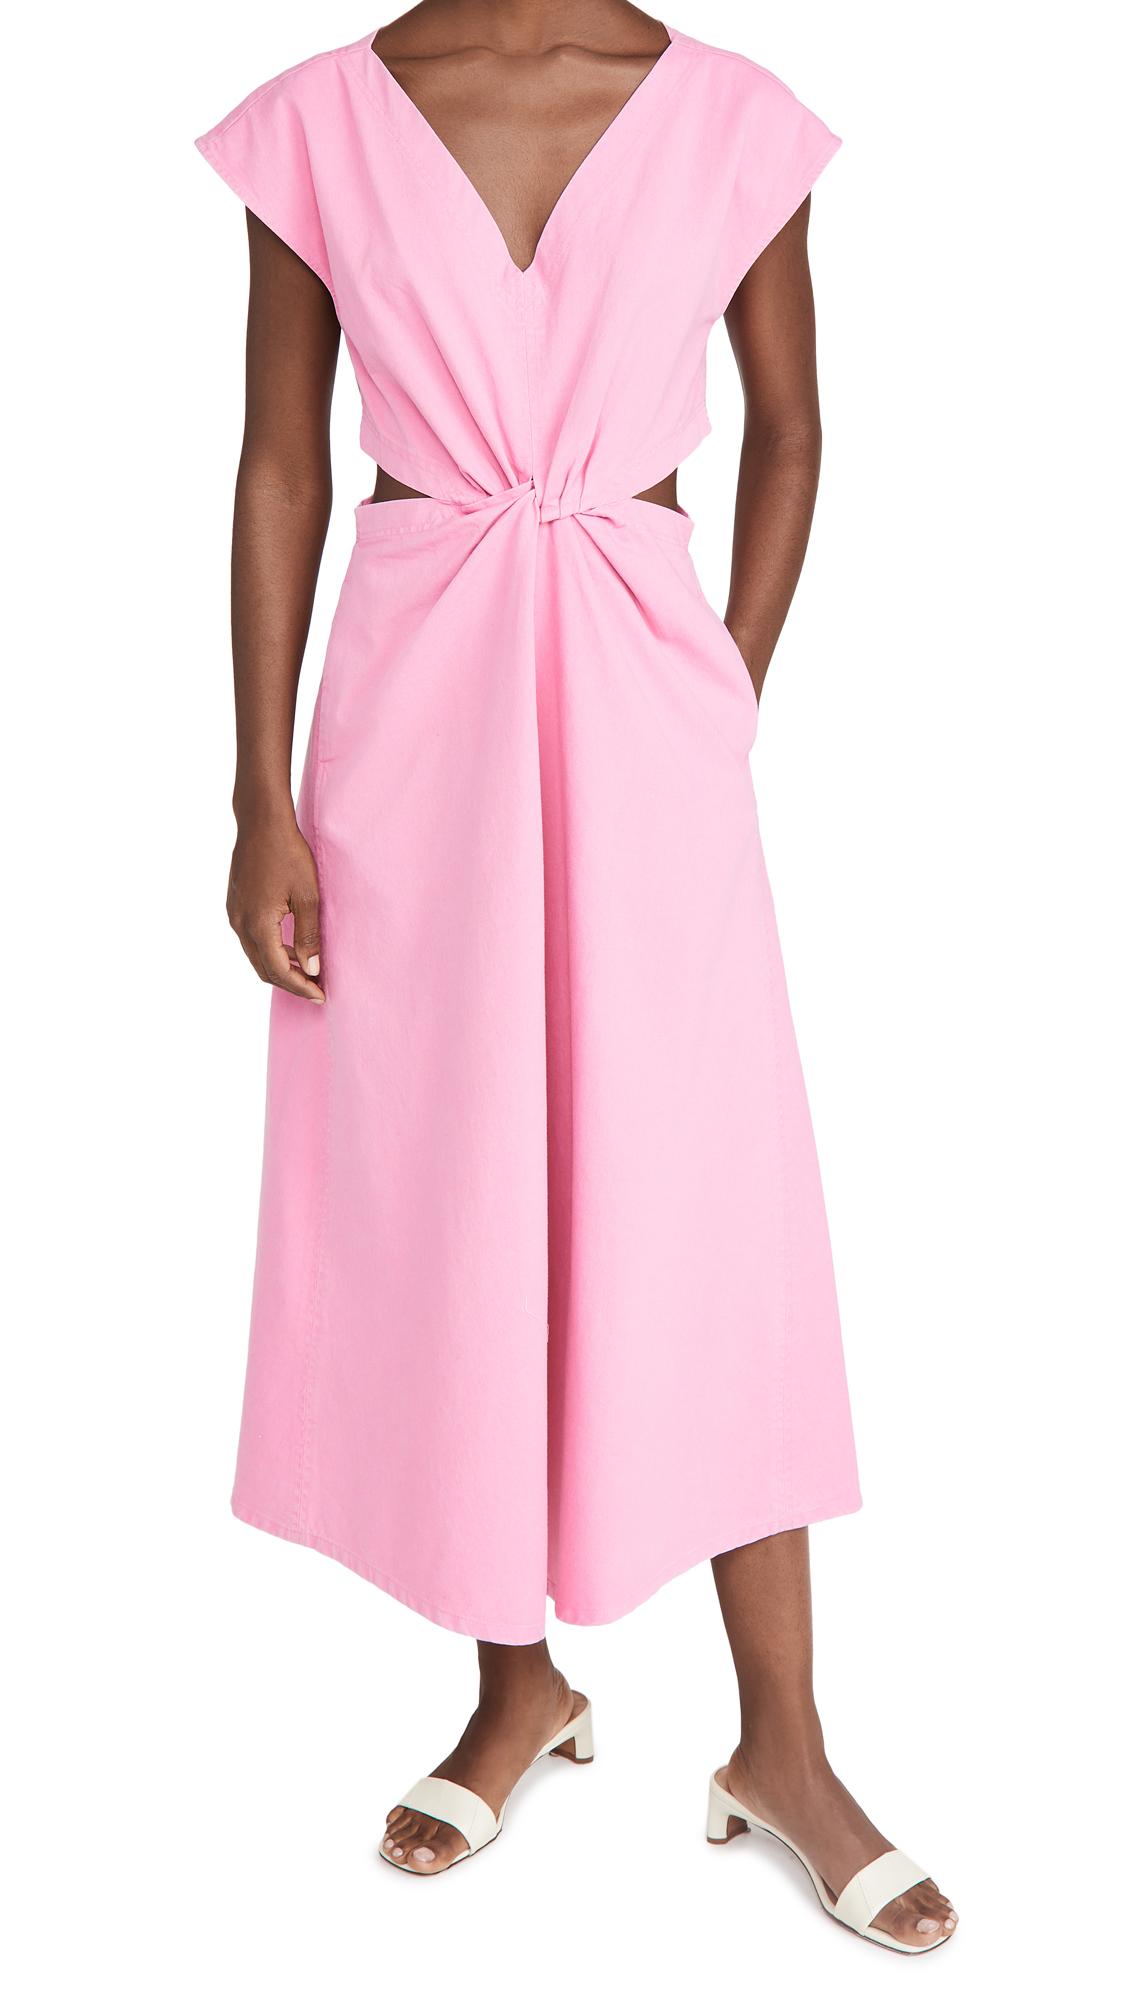 Rachel Comey Albero Dress